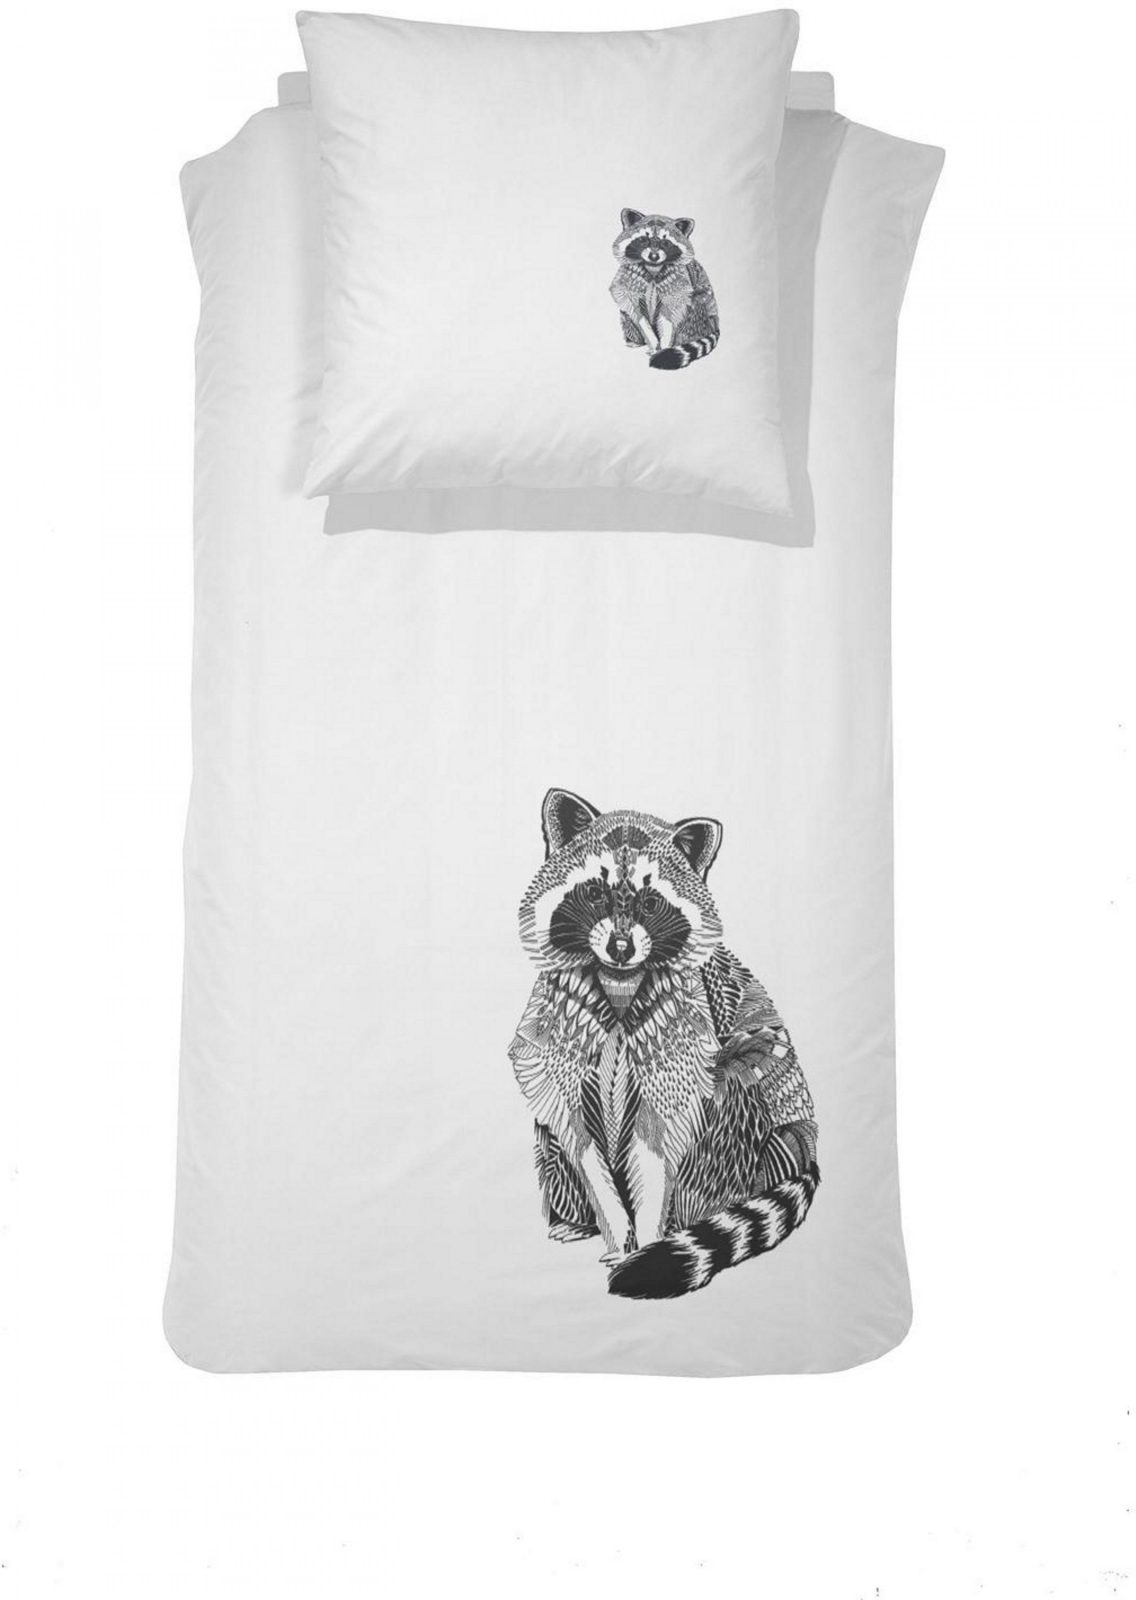 Bettwäsche Damai Raccoon Mit Tiermotiv Bestellen  Baur von Bettwäsche Mit Tiermotiv Bild